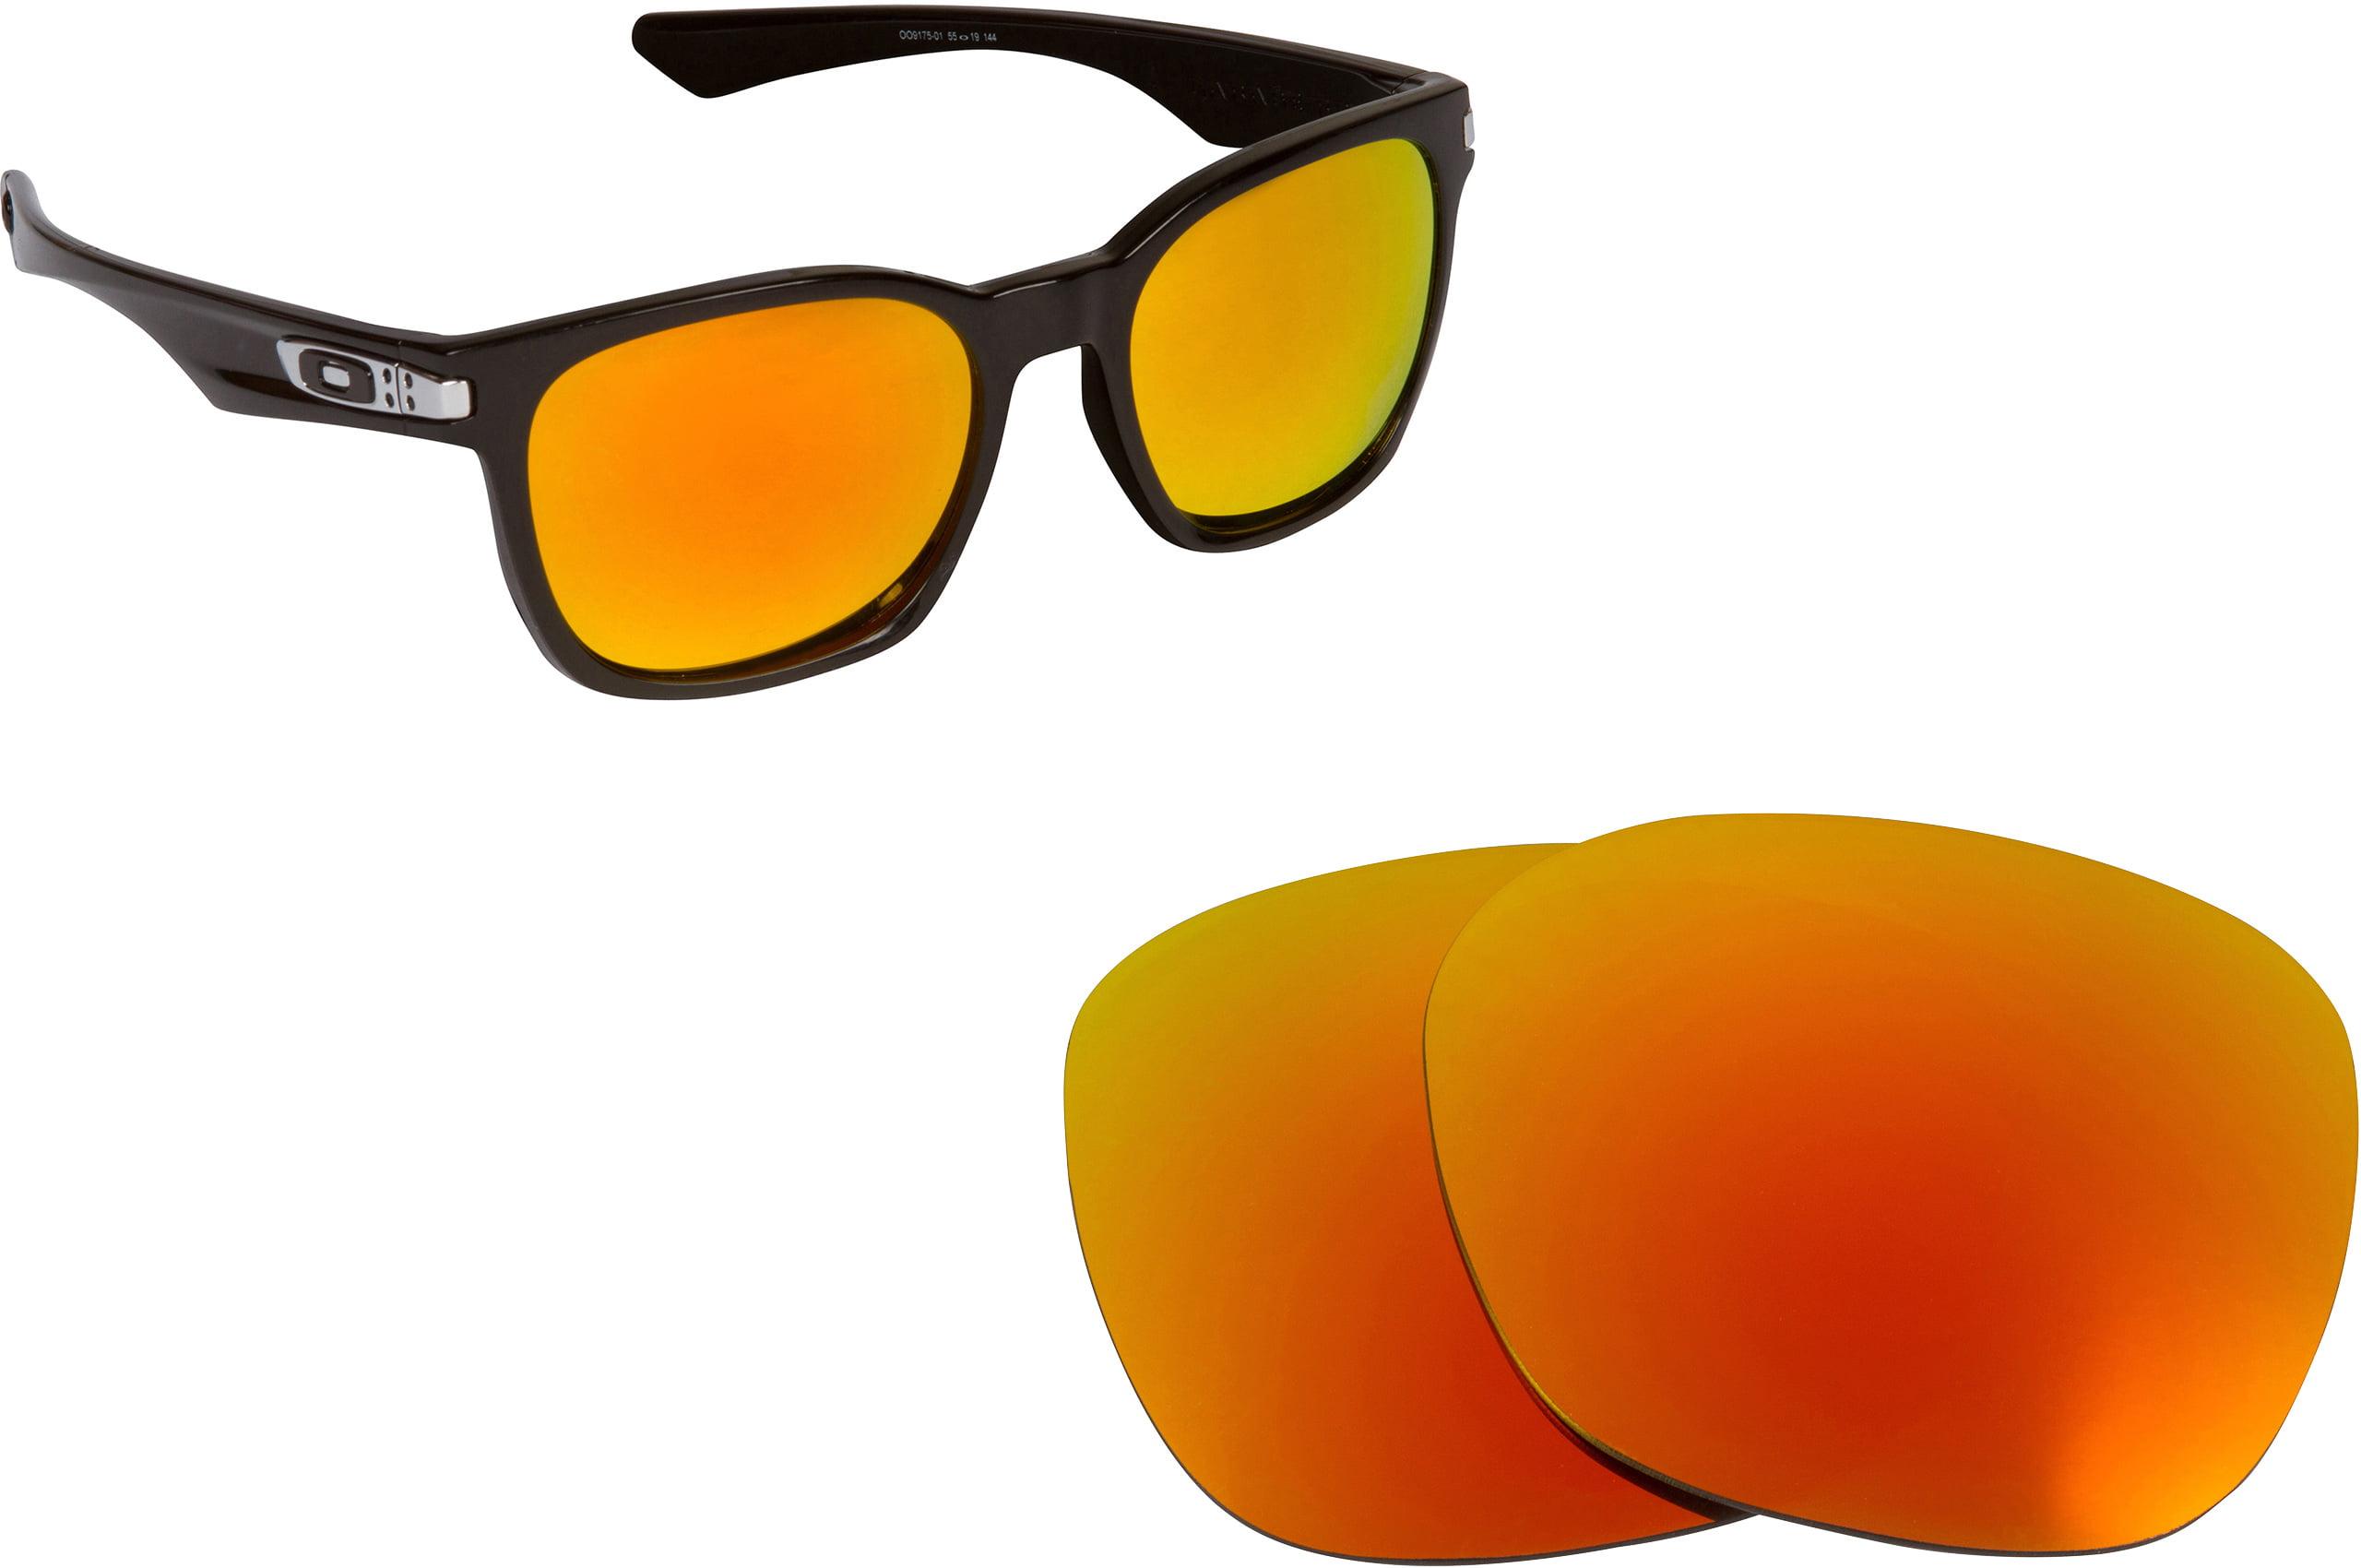 15c79588f9 Seek Optics - SEEK Polarized Replacement Lenses for Oakley GARAGE ROCK  Yellow Green Mirror - Walmart.com